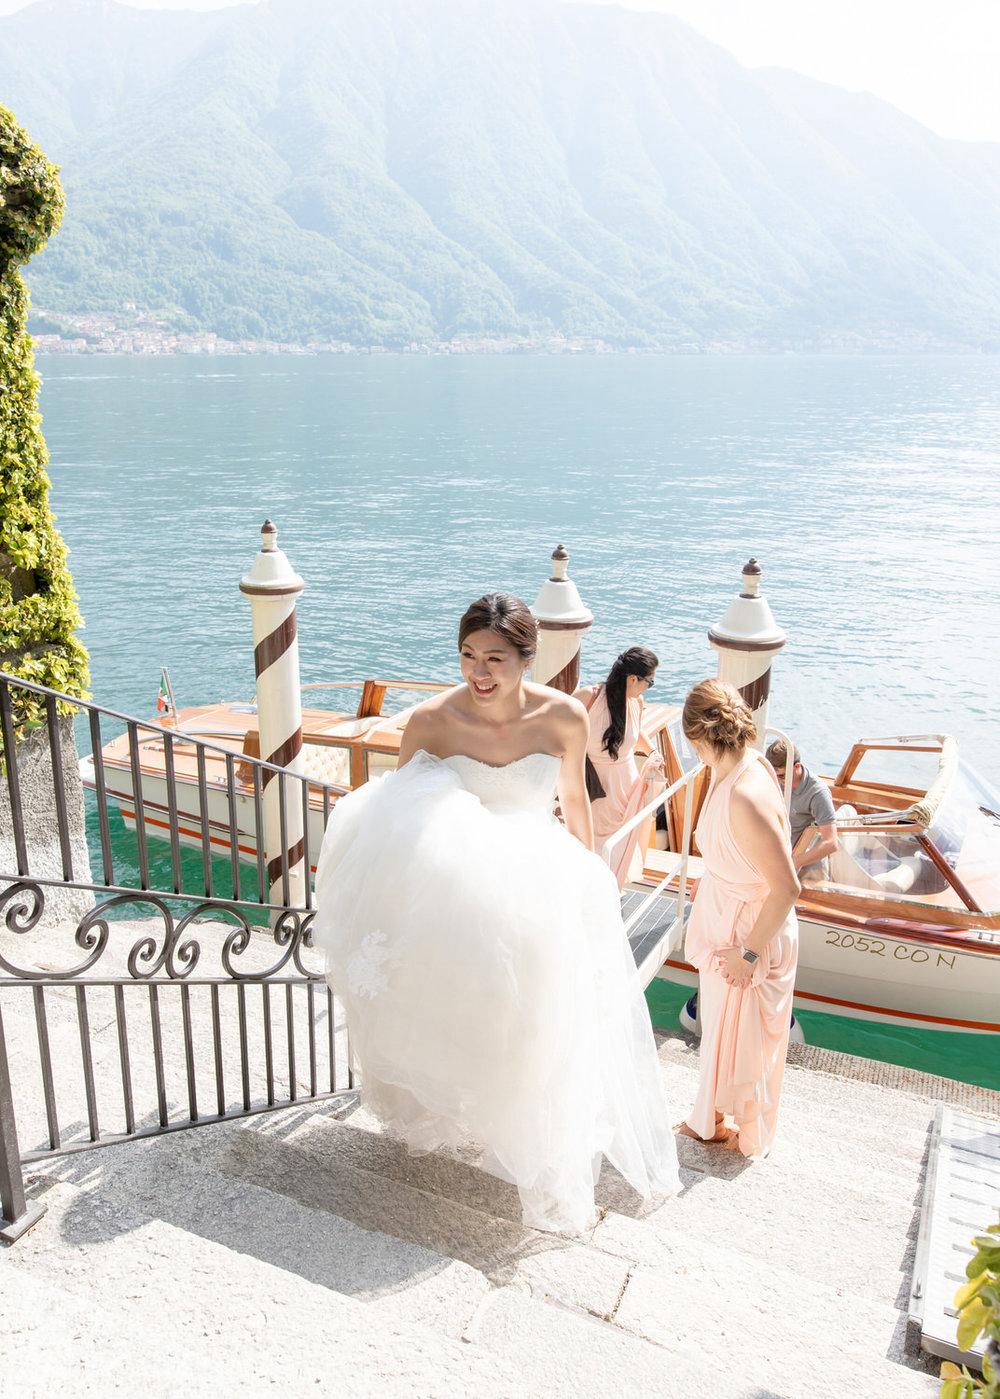 lake-como-wedding-photographer-J&D-©bottega53-35.JPG